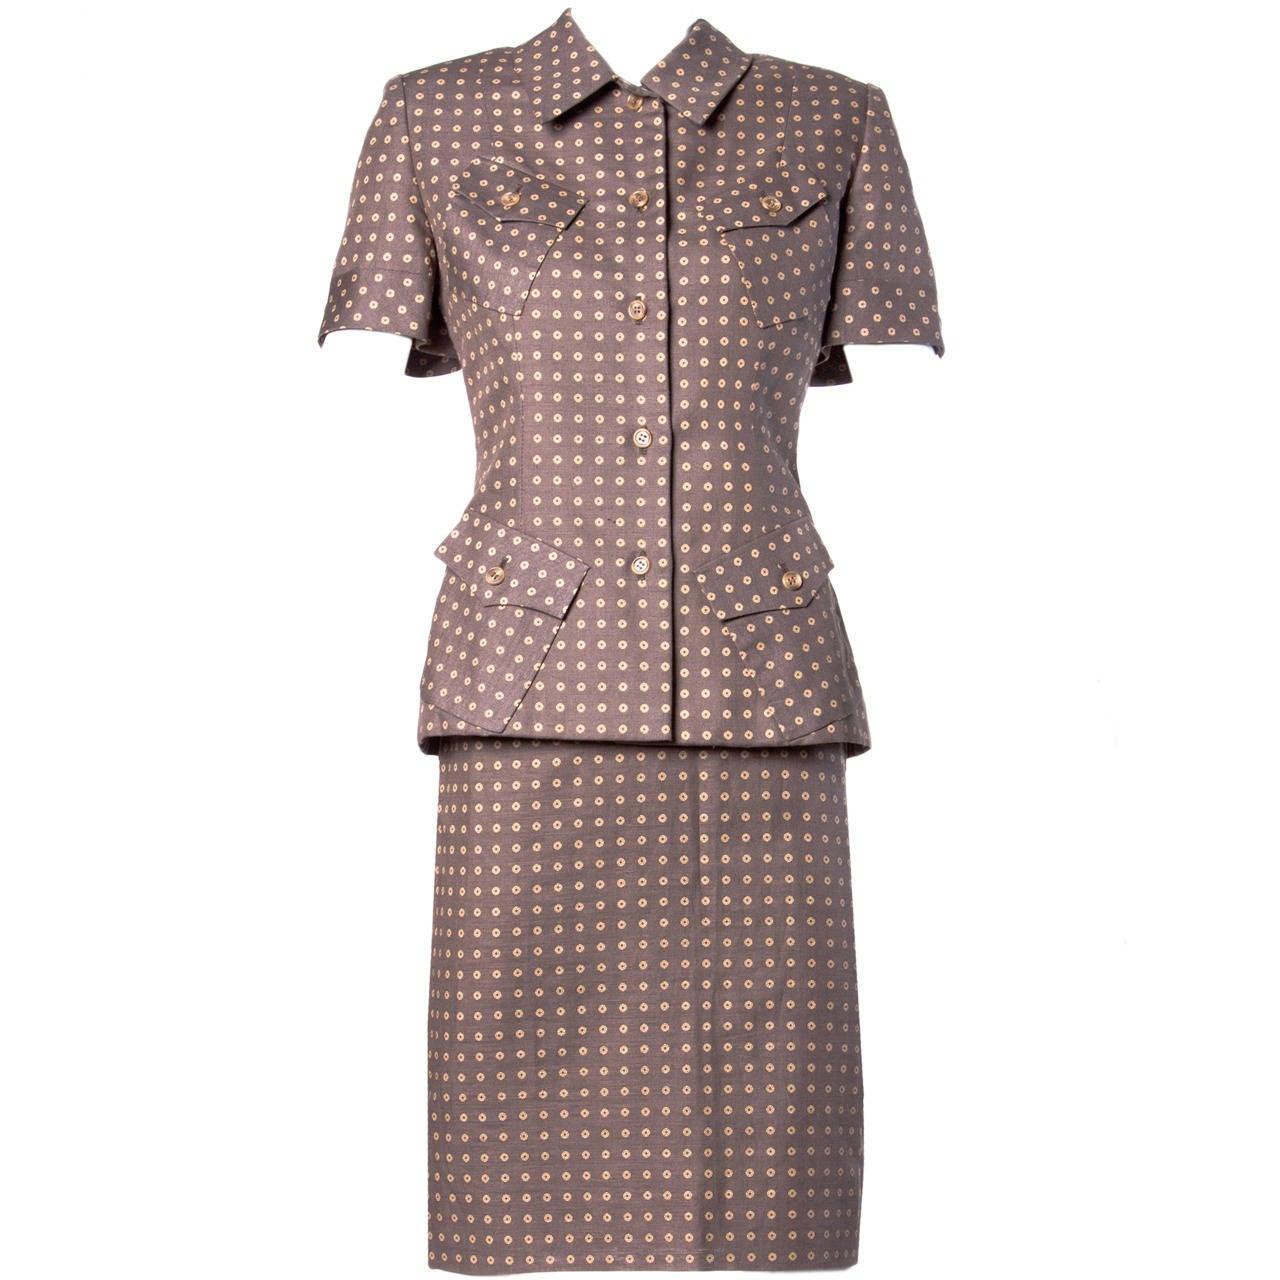 Bill Blass Unworn Deadstock Vintage Wool Jacket + Skirt Suit For Sale